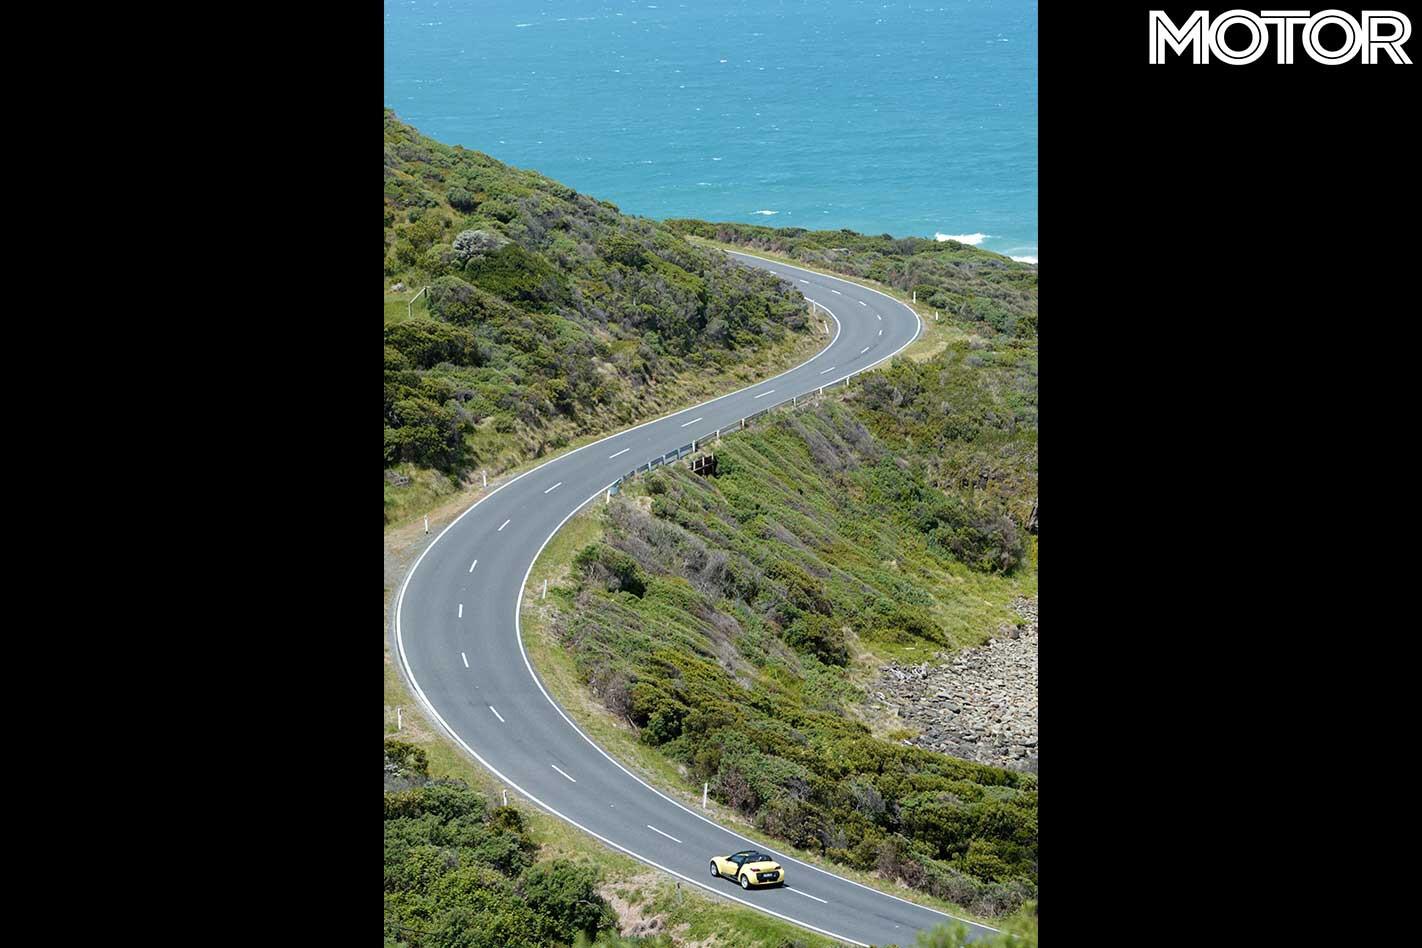 2004 Smart Roadster Great Ocean Road Jpg